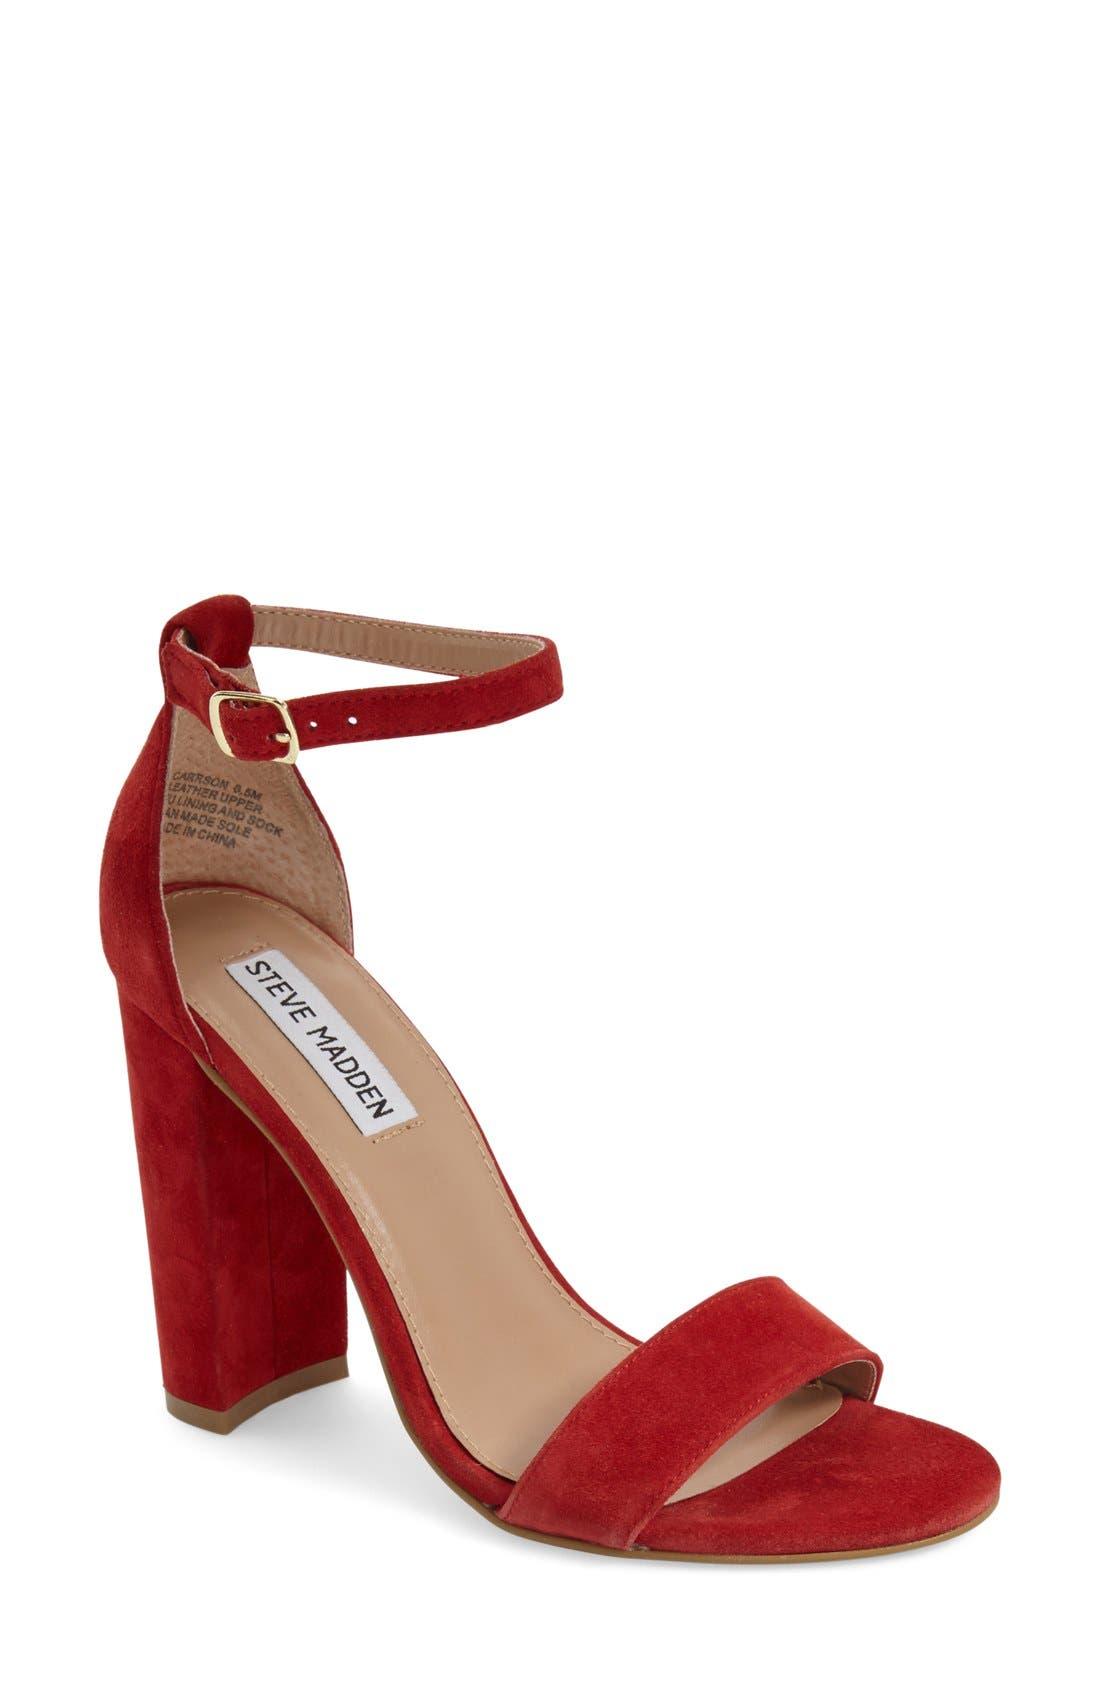 Carrson Sandal,                         Main,                         color, Red Suede